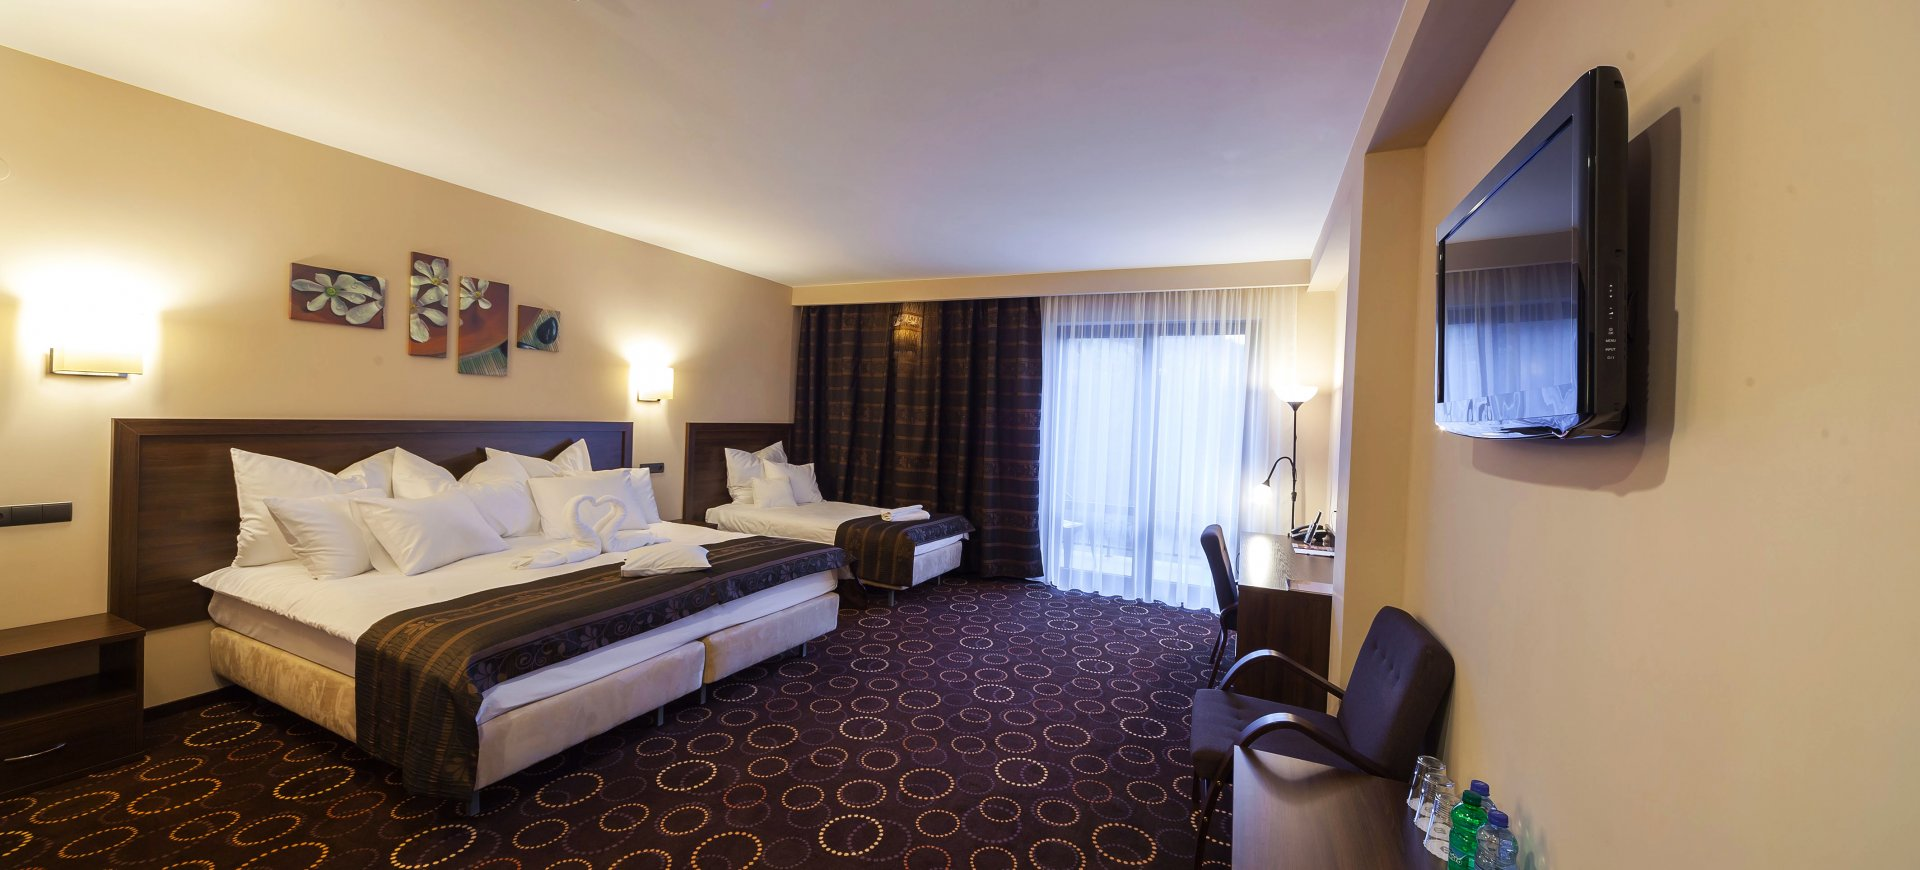 Triple Room (****) - 4stars standard